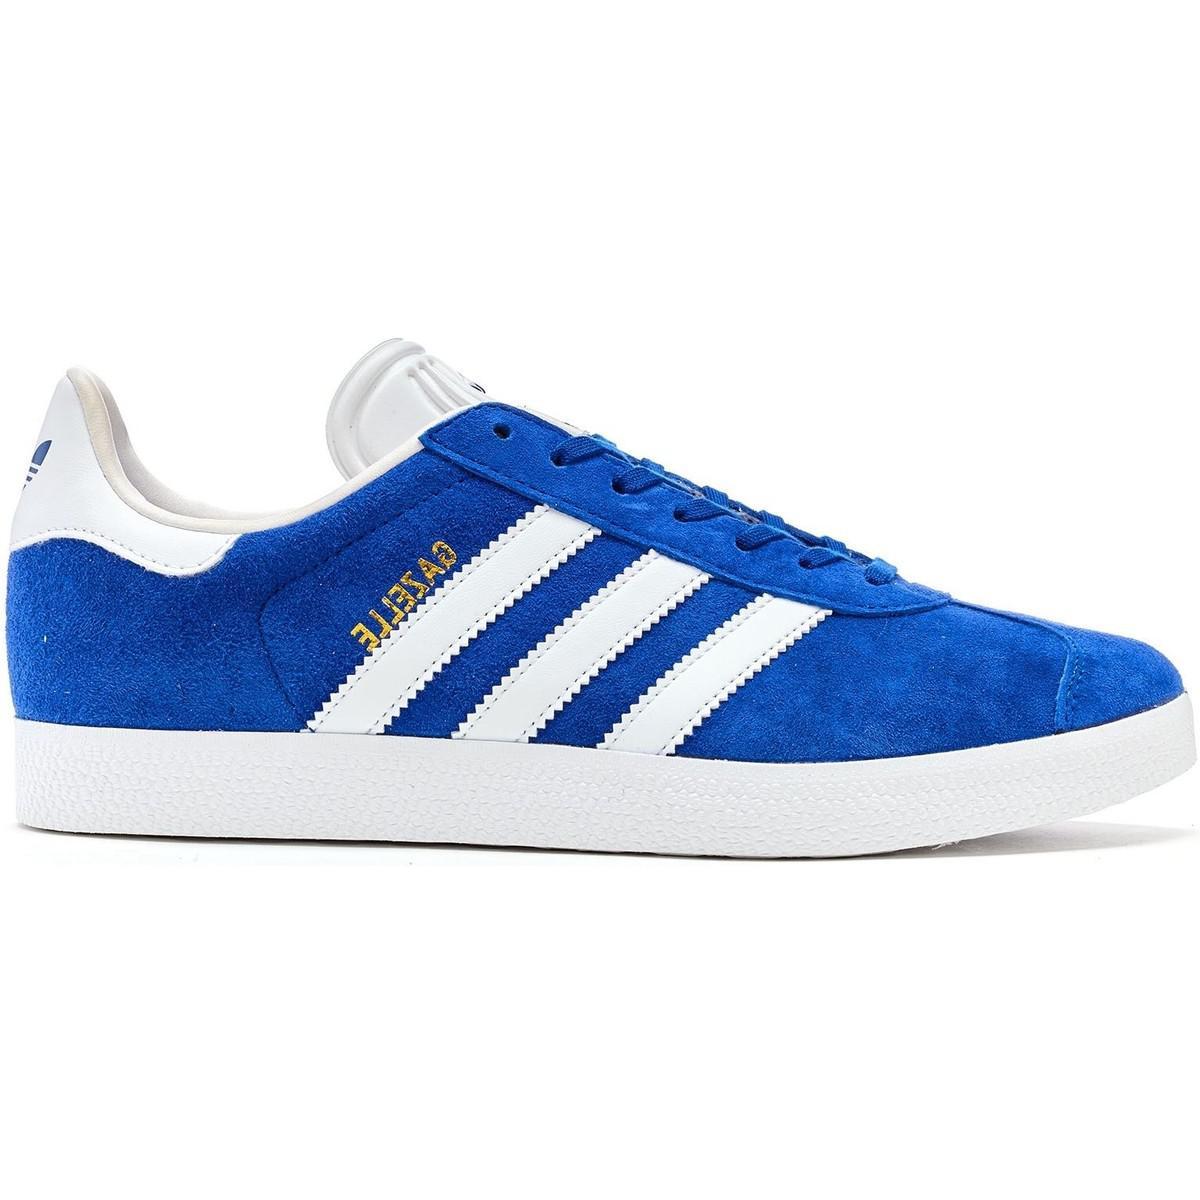 df52b4e13dd8e1 Adidas Originals Gazelle Suede Trainers In Collegiate Royal Blue Whi ...